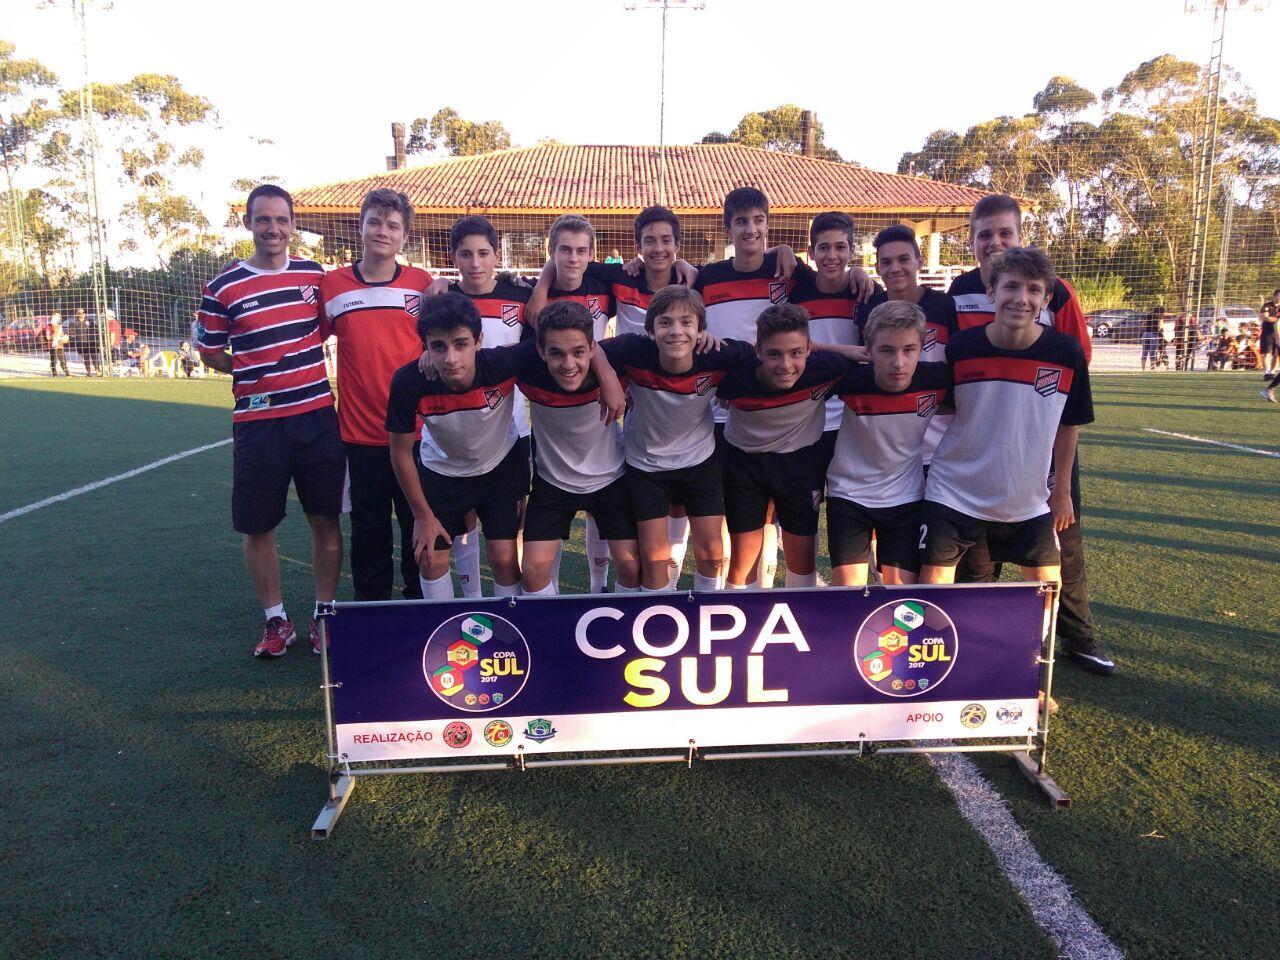 c00543ecf54ca Futebol Futebol Futebol Futebol Futebol